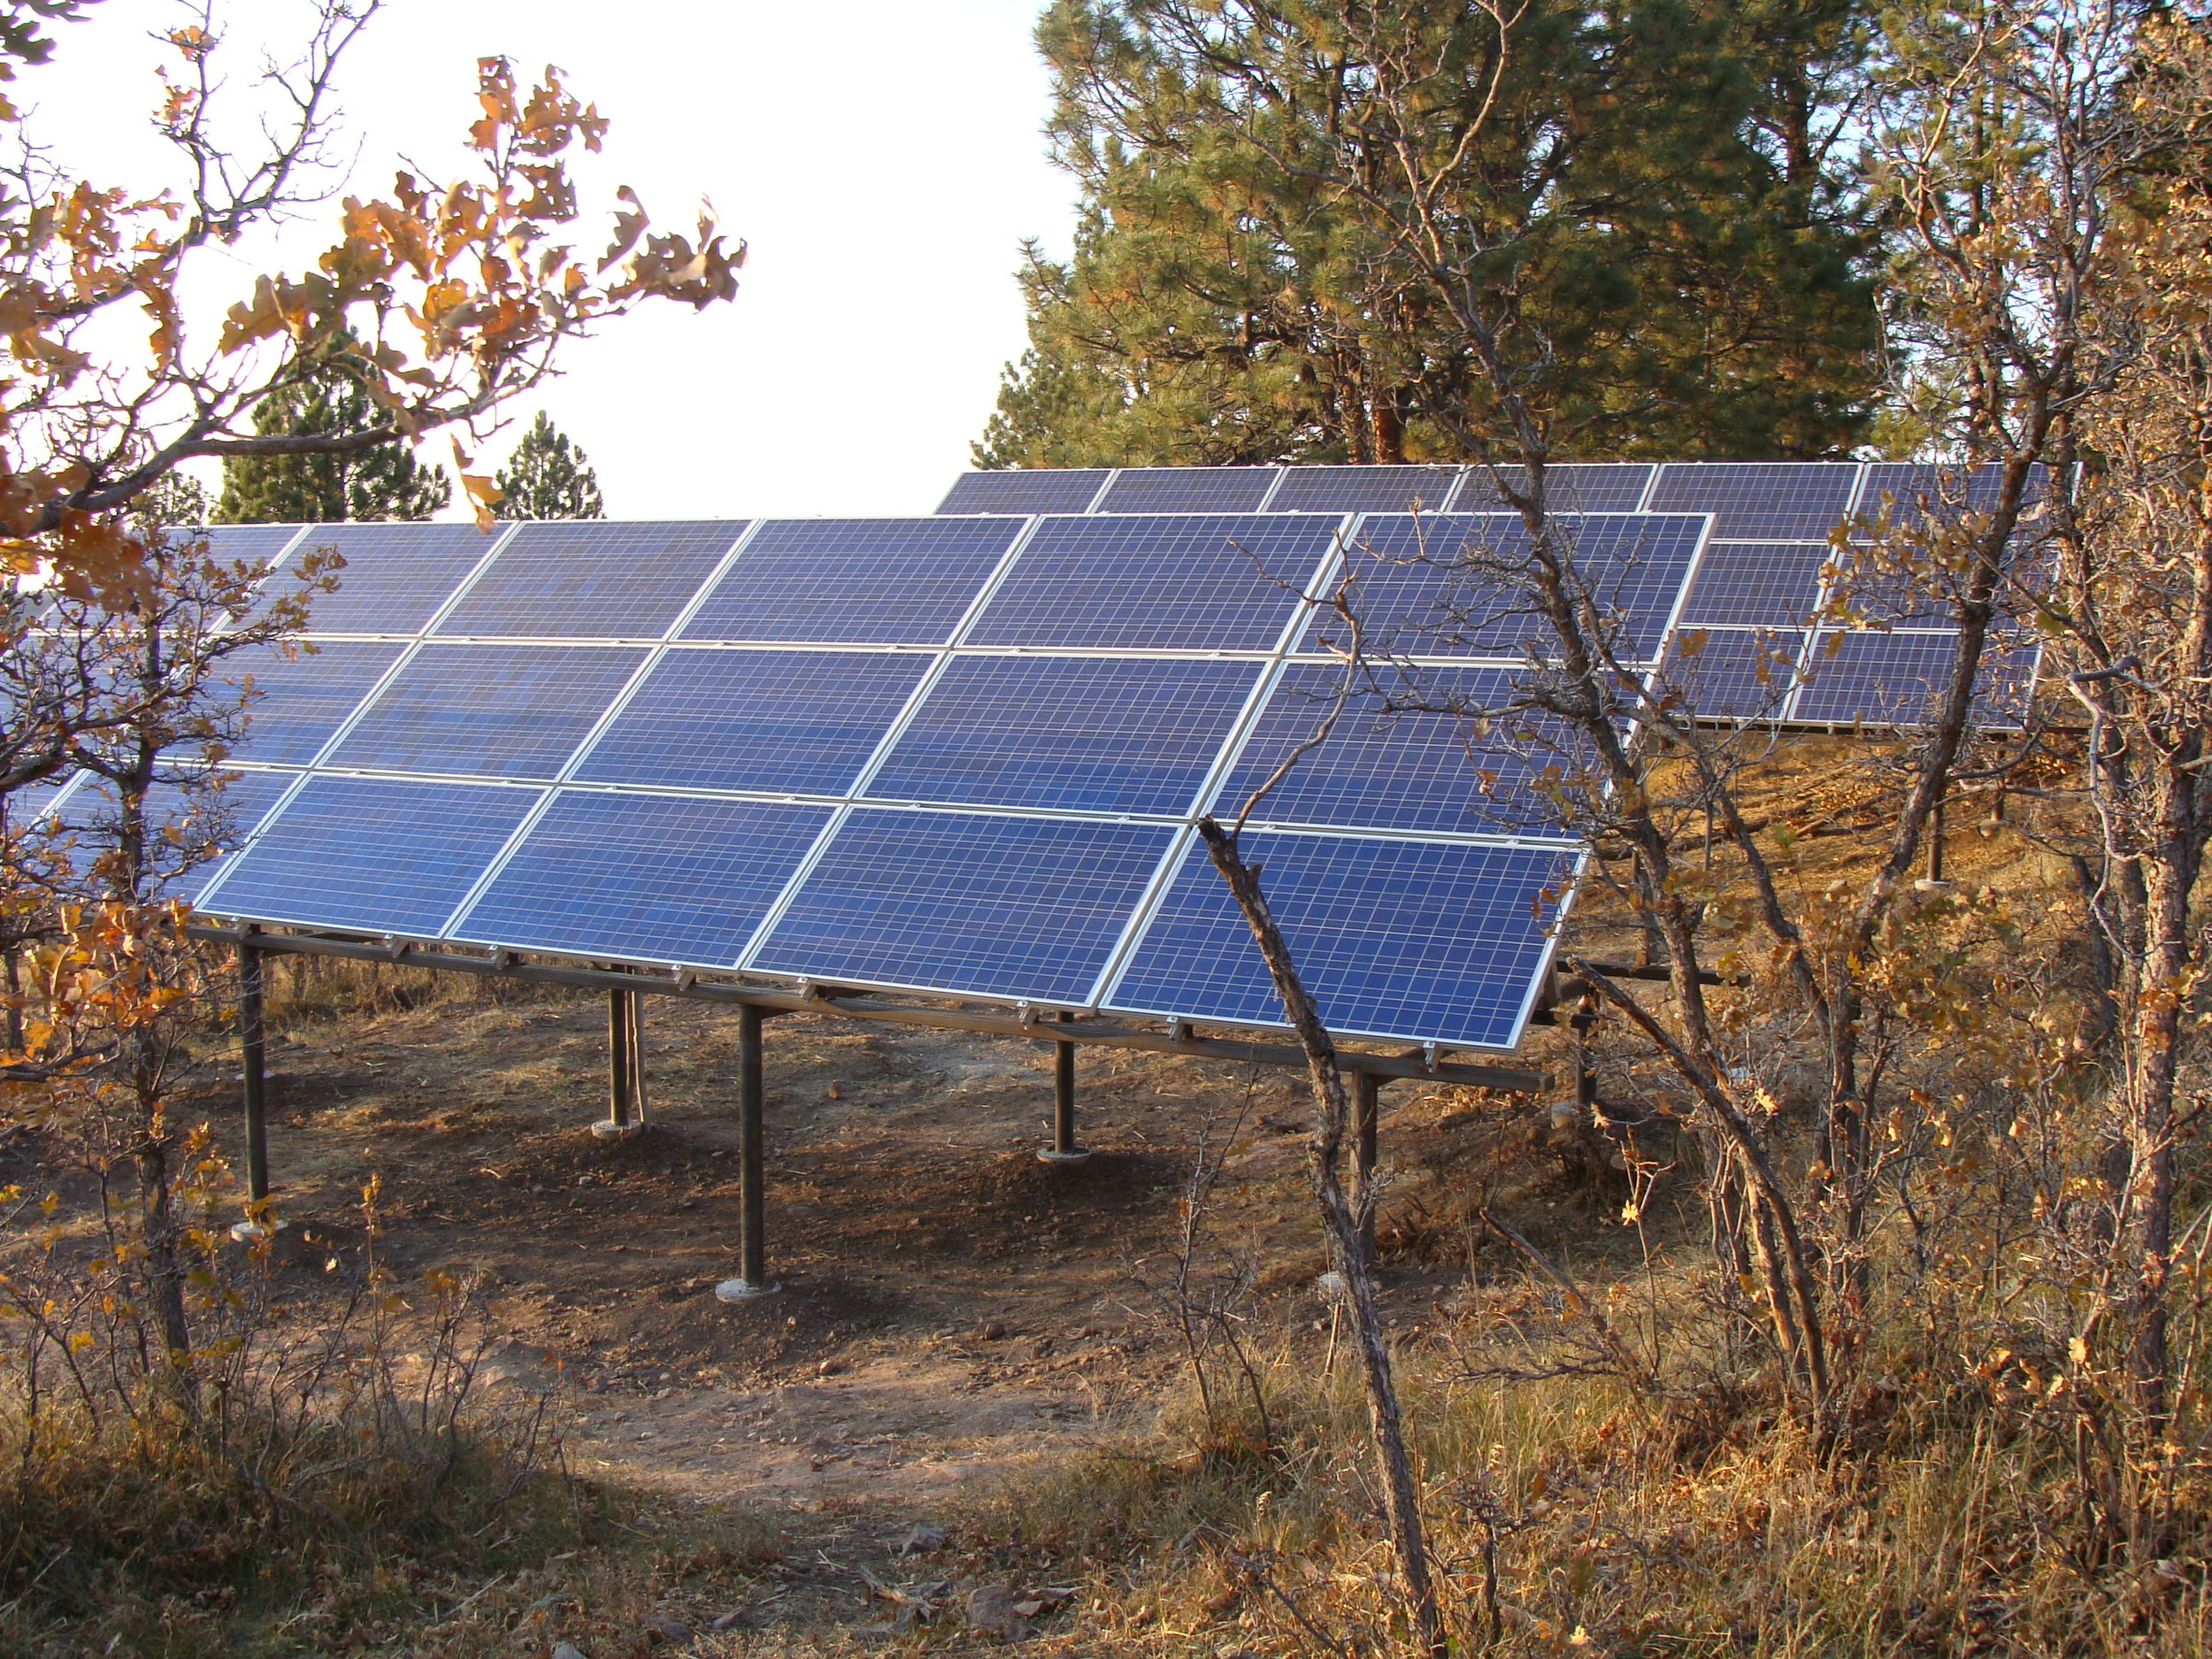 alternative-power-enterprises-solar-installation-projects3.jpg